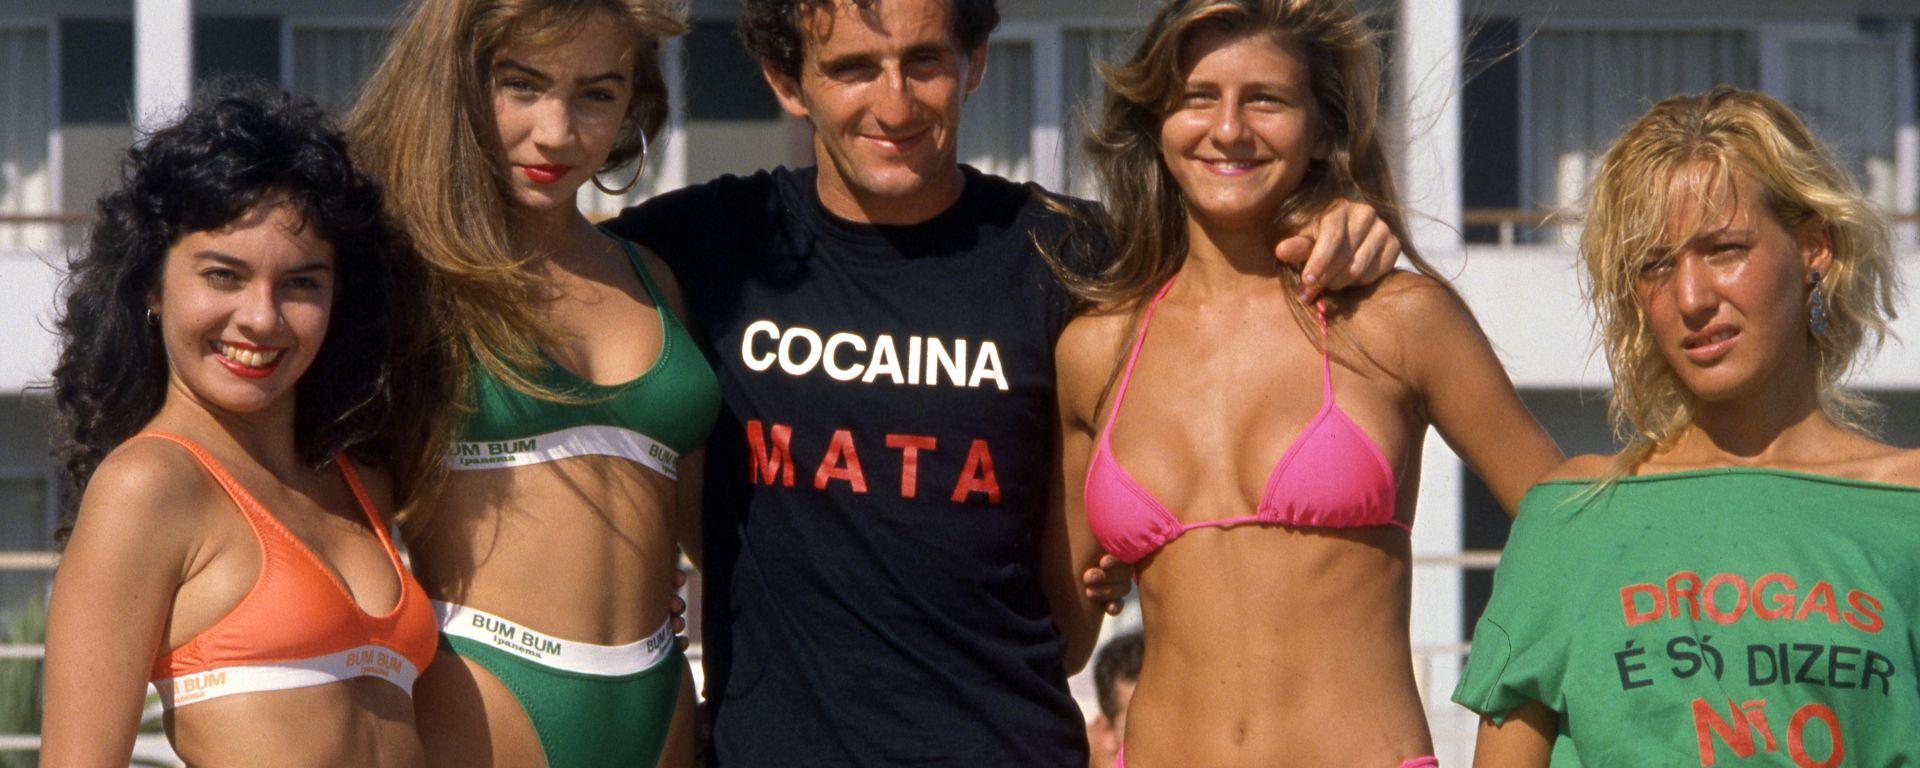 F1 GP Brasile 1989, Jacarepagua: Alain Prost e il suo ficcante messaggio antidroga